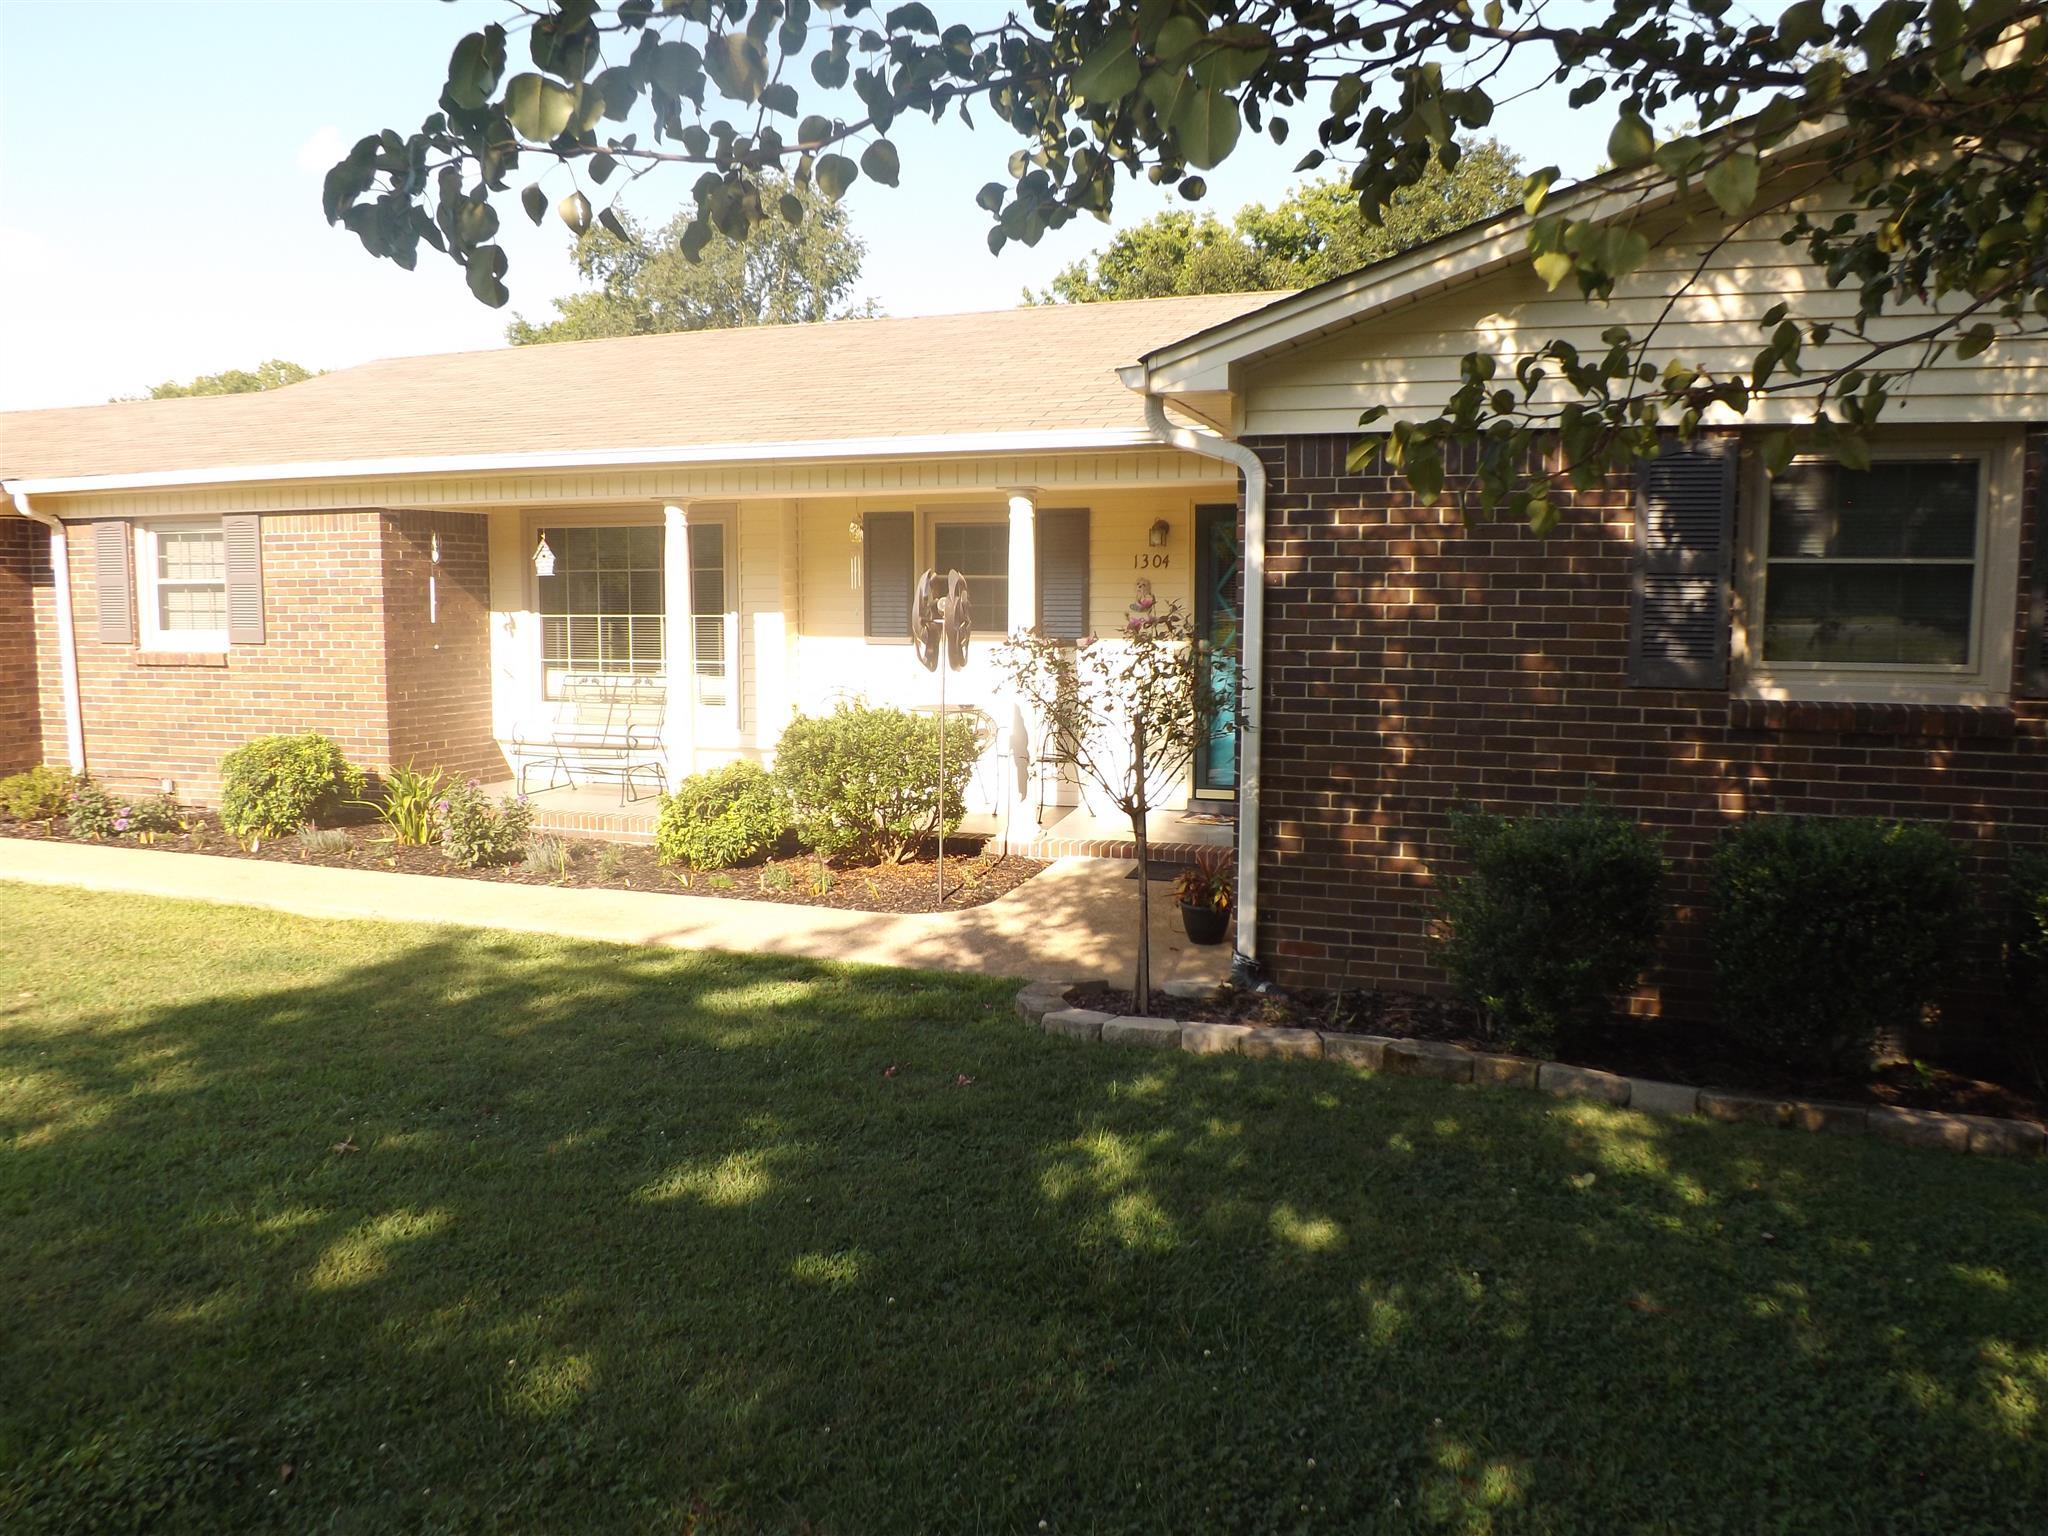 1304 Jackson Dr, Pulaski, TN 38478 - Pulaski, TN real estate listing